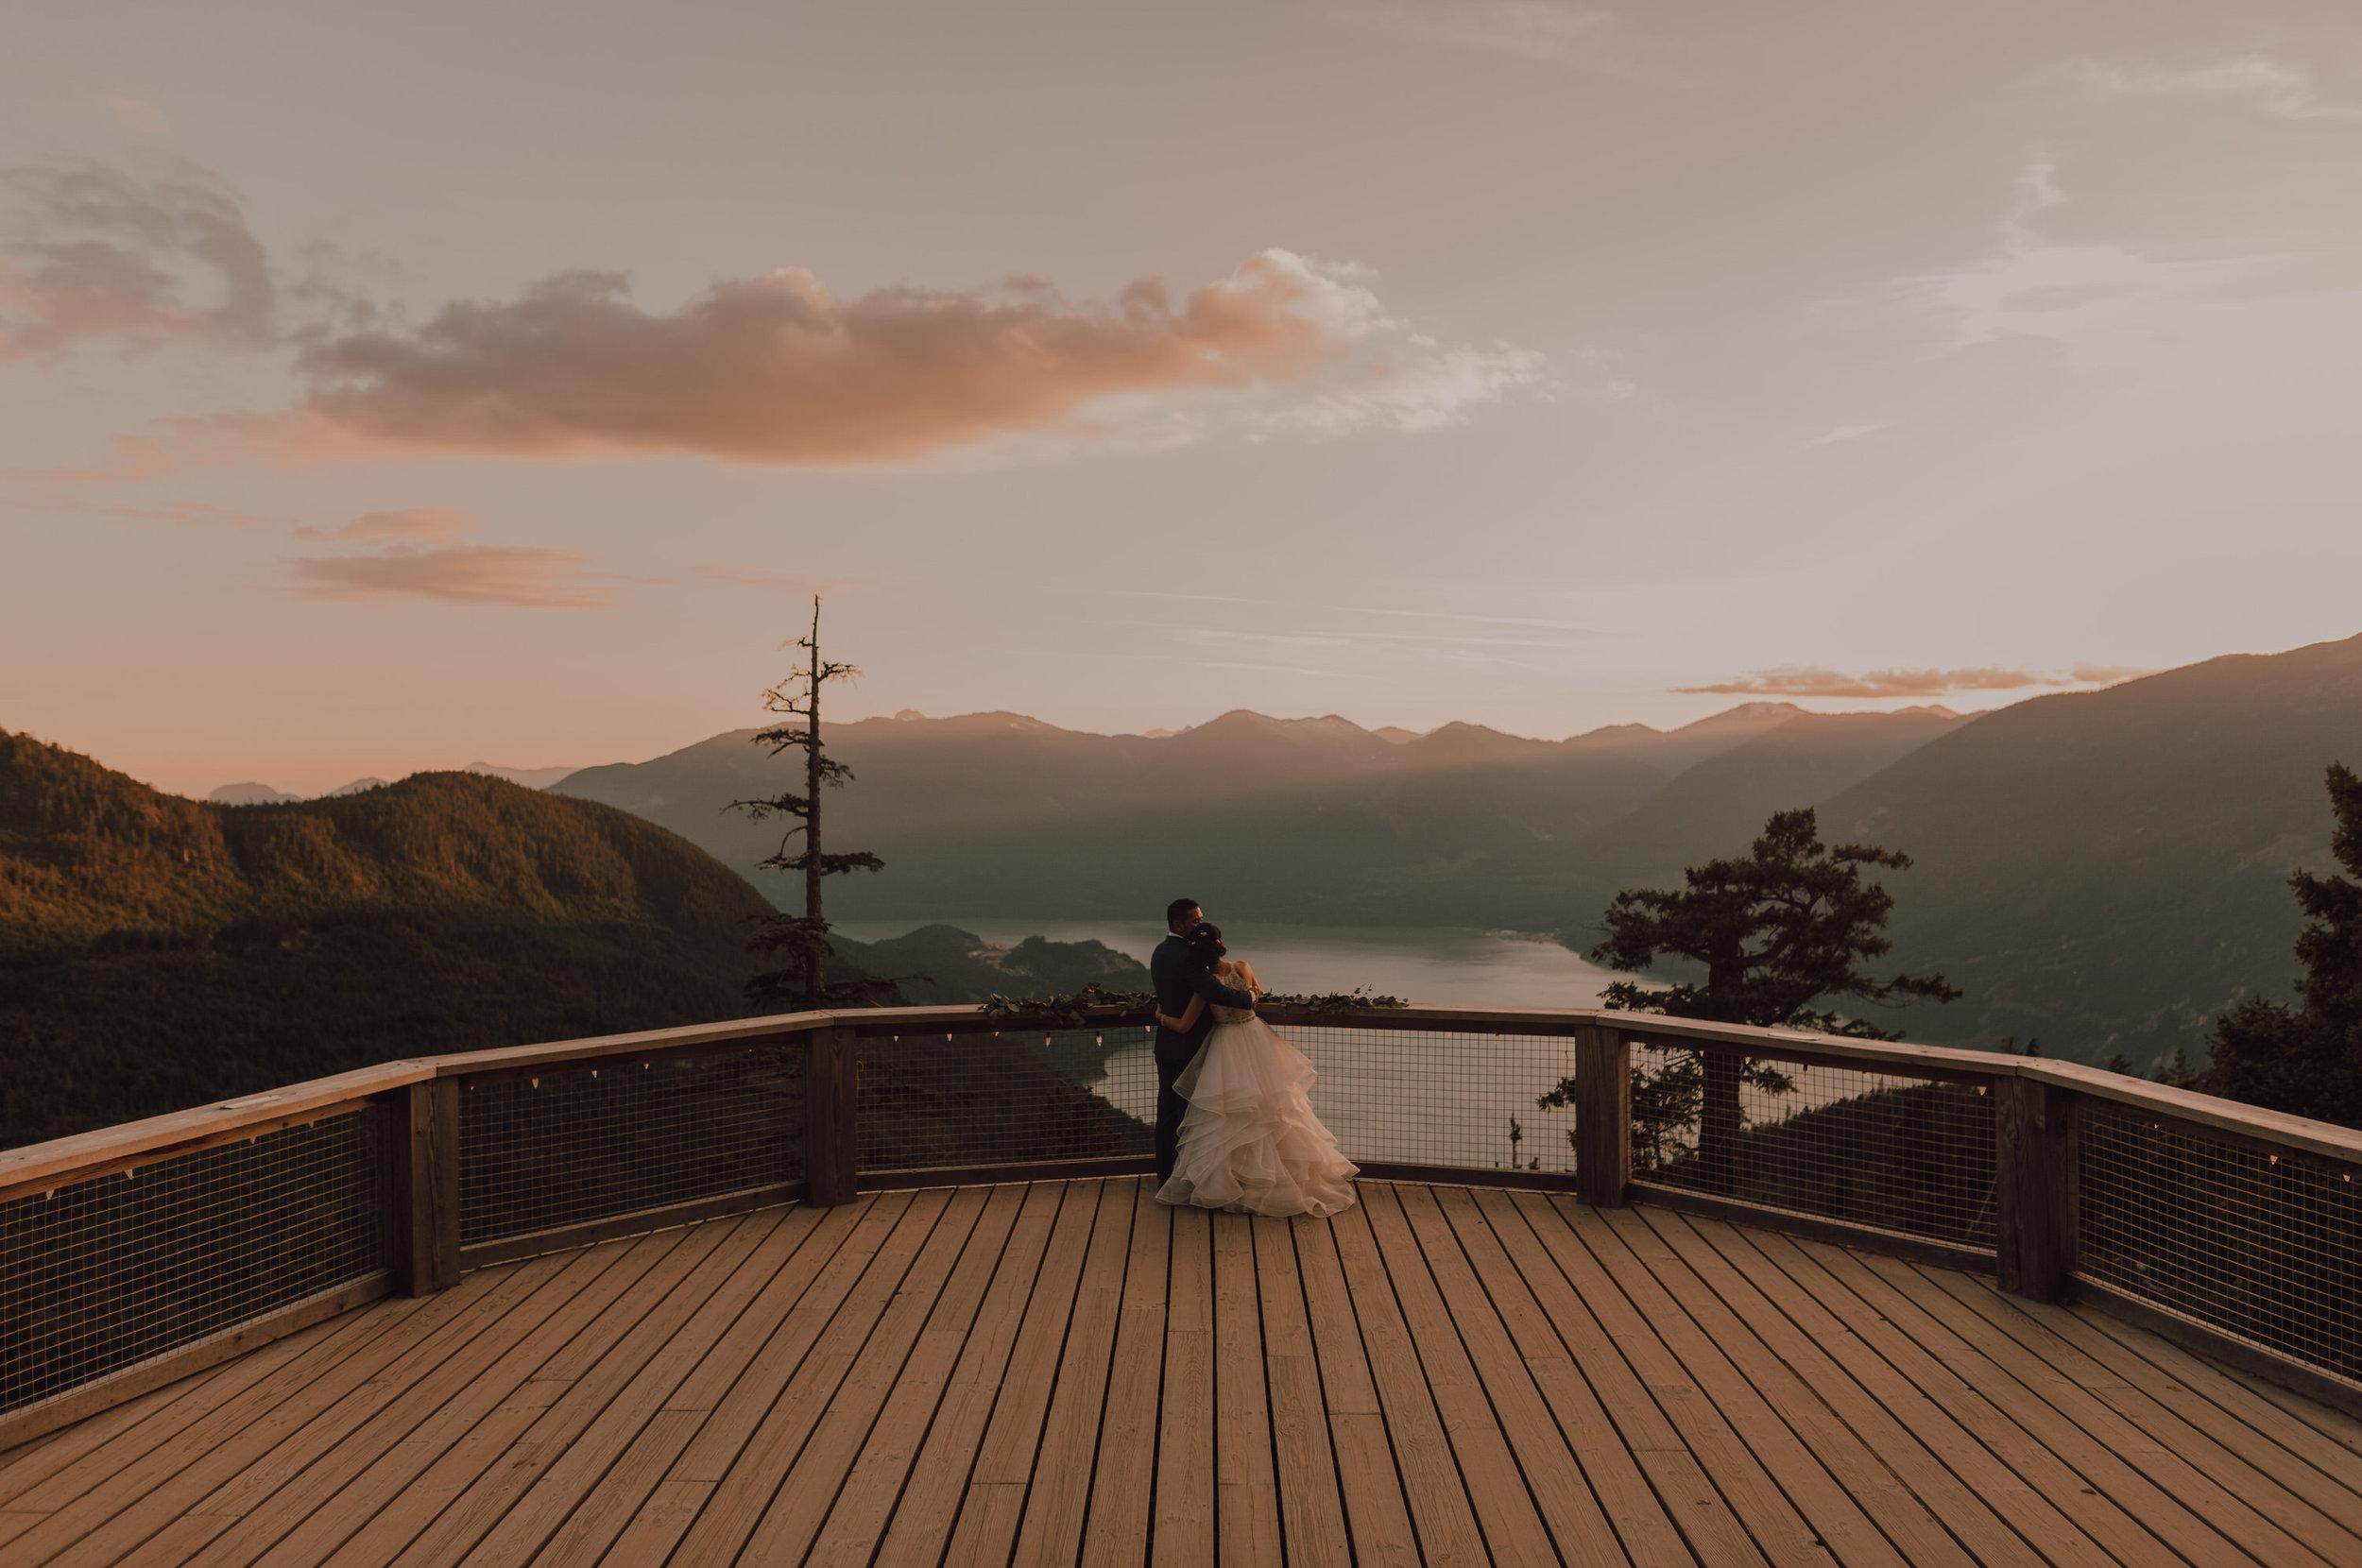 Squamish Wedding Photographer - Sea to Sky Gondola Wedding Photos -  Vancouver Wedding Photographer & Videographer - Sunshine Coast Wedding Photos - Sunshine Coast Wedding Photographer - Jennifer Picard Photography - IMG_5247.jpg